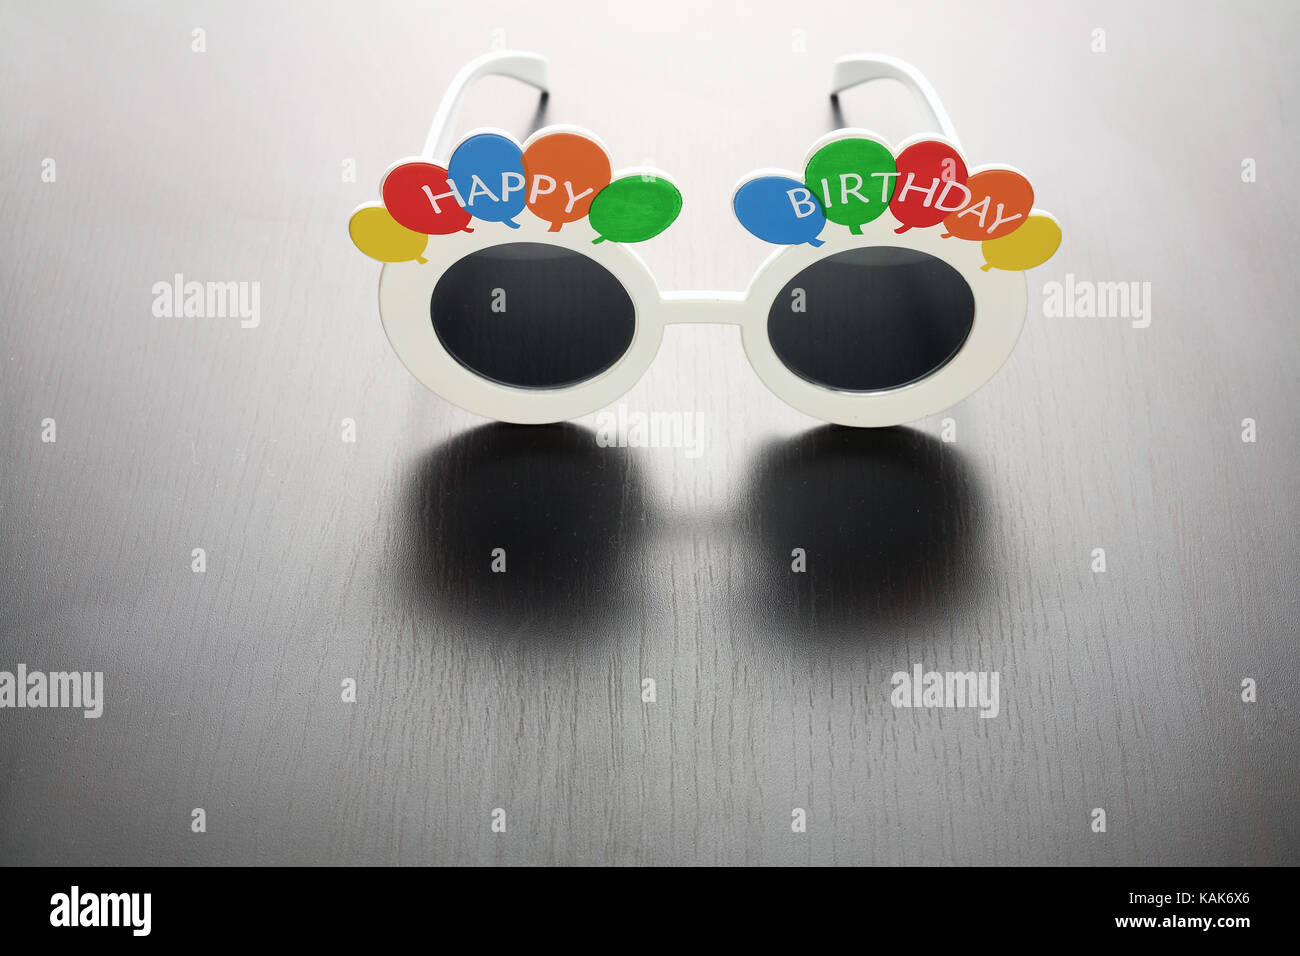 Party Eyewear on Wooden Background - Stock Image